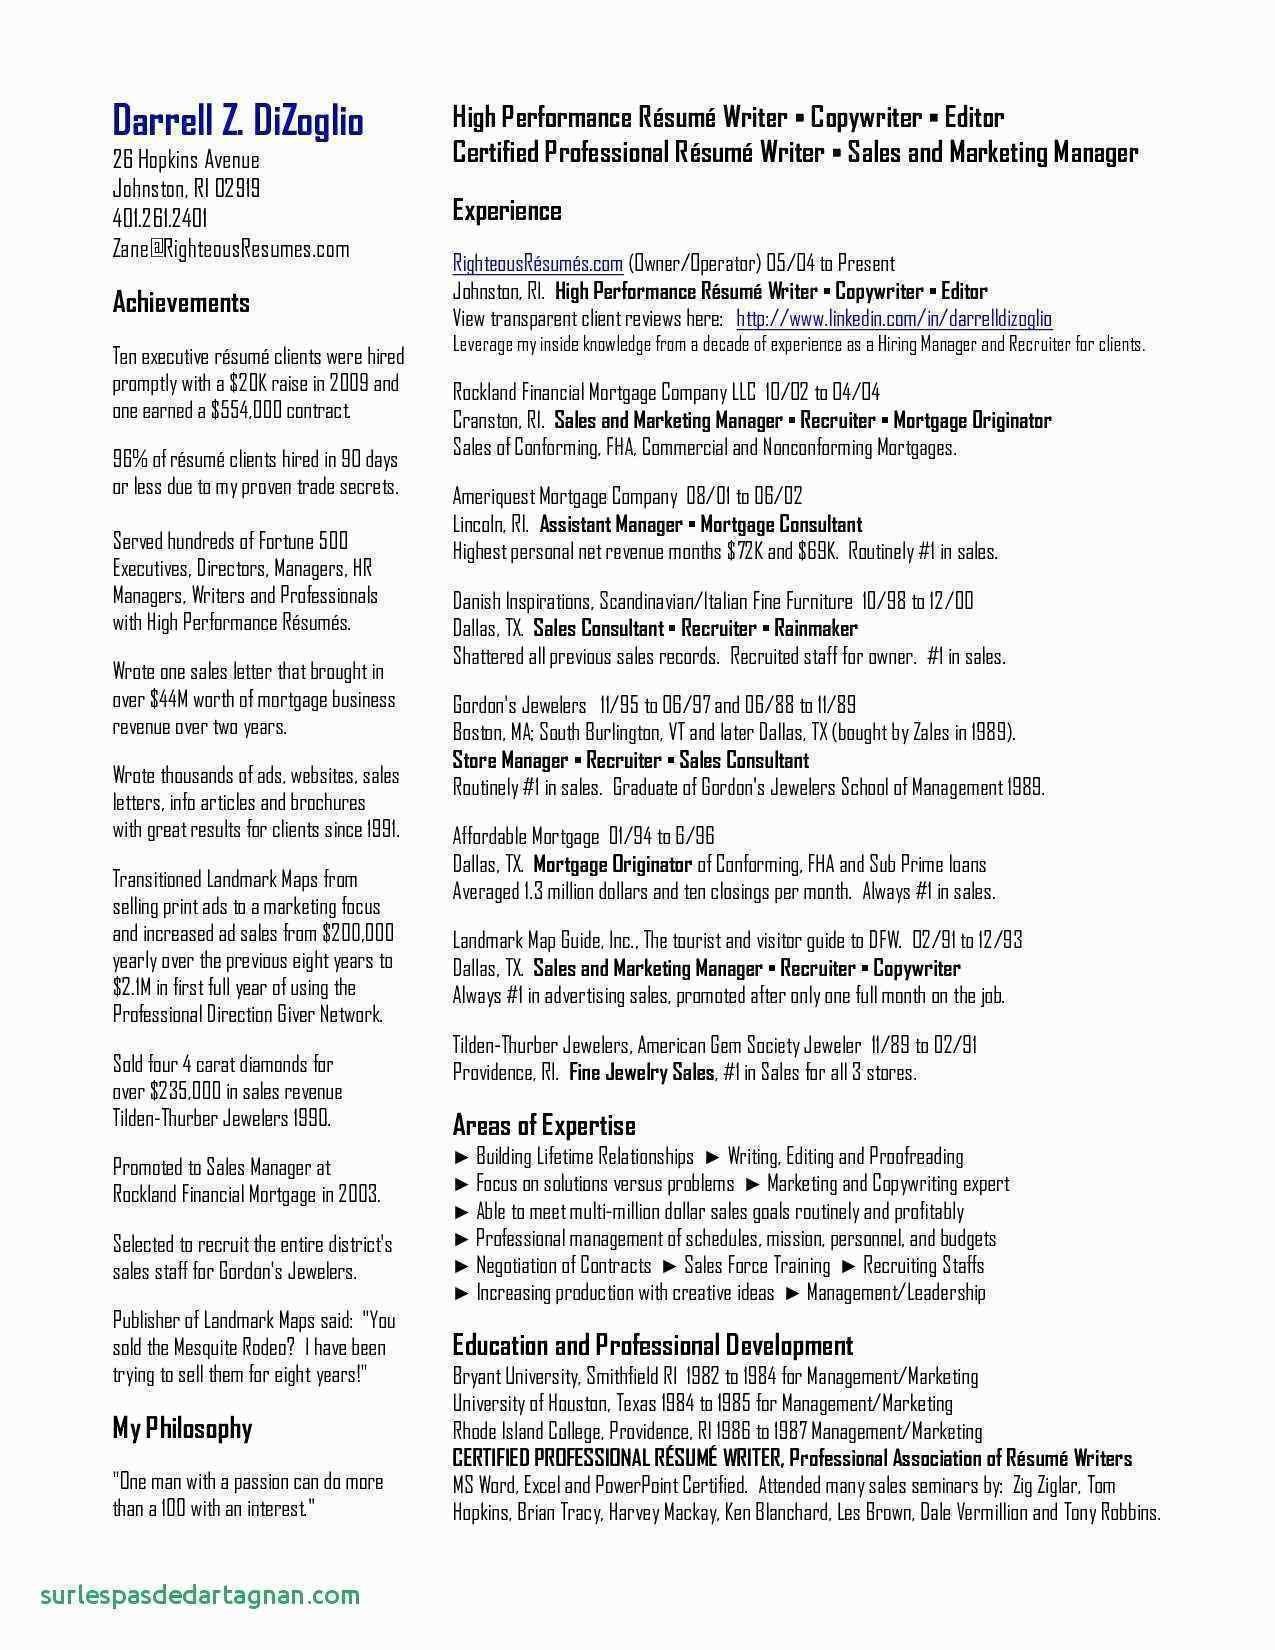 Kalender Drucken 2017 Kalender Drucken 2017 2017 Calendar Template Fresh March Monthly – Wantedforwarcrimes